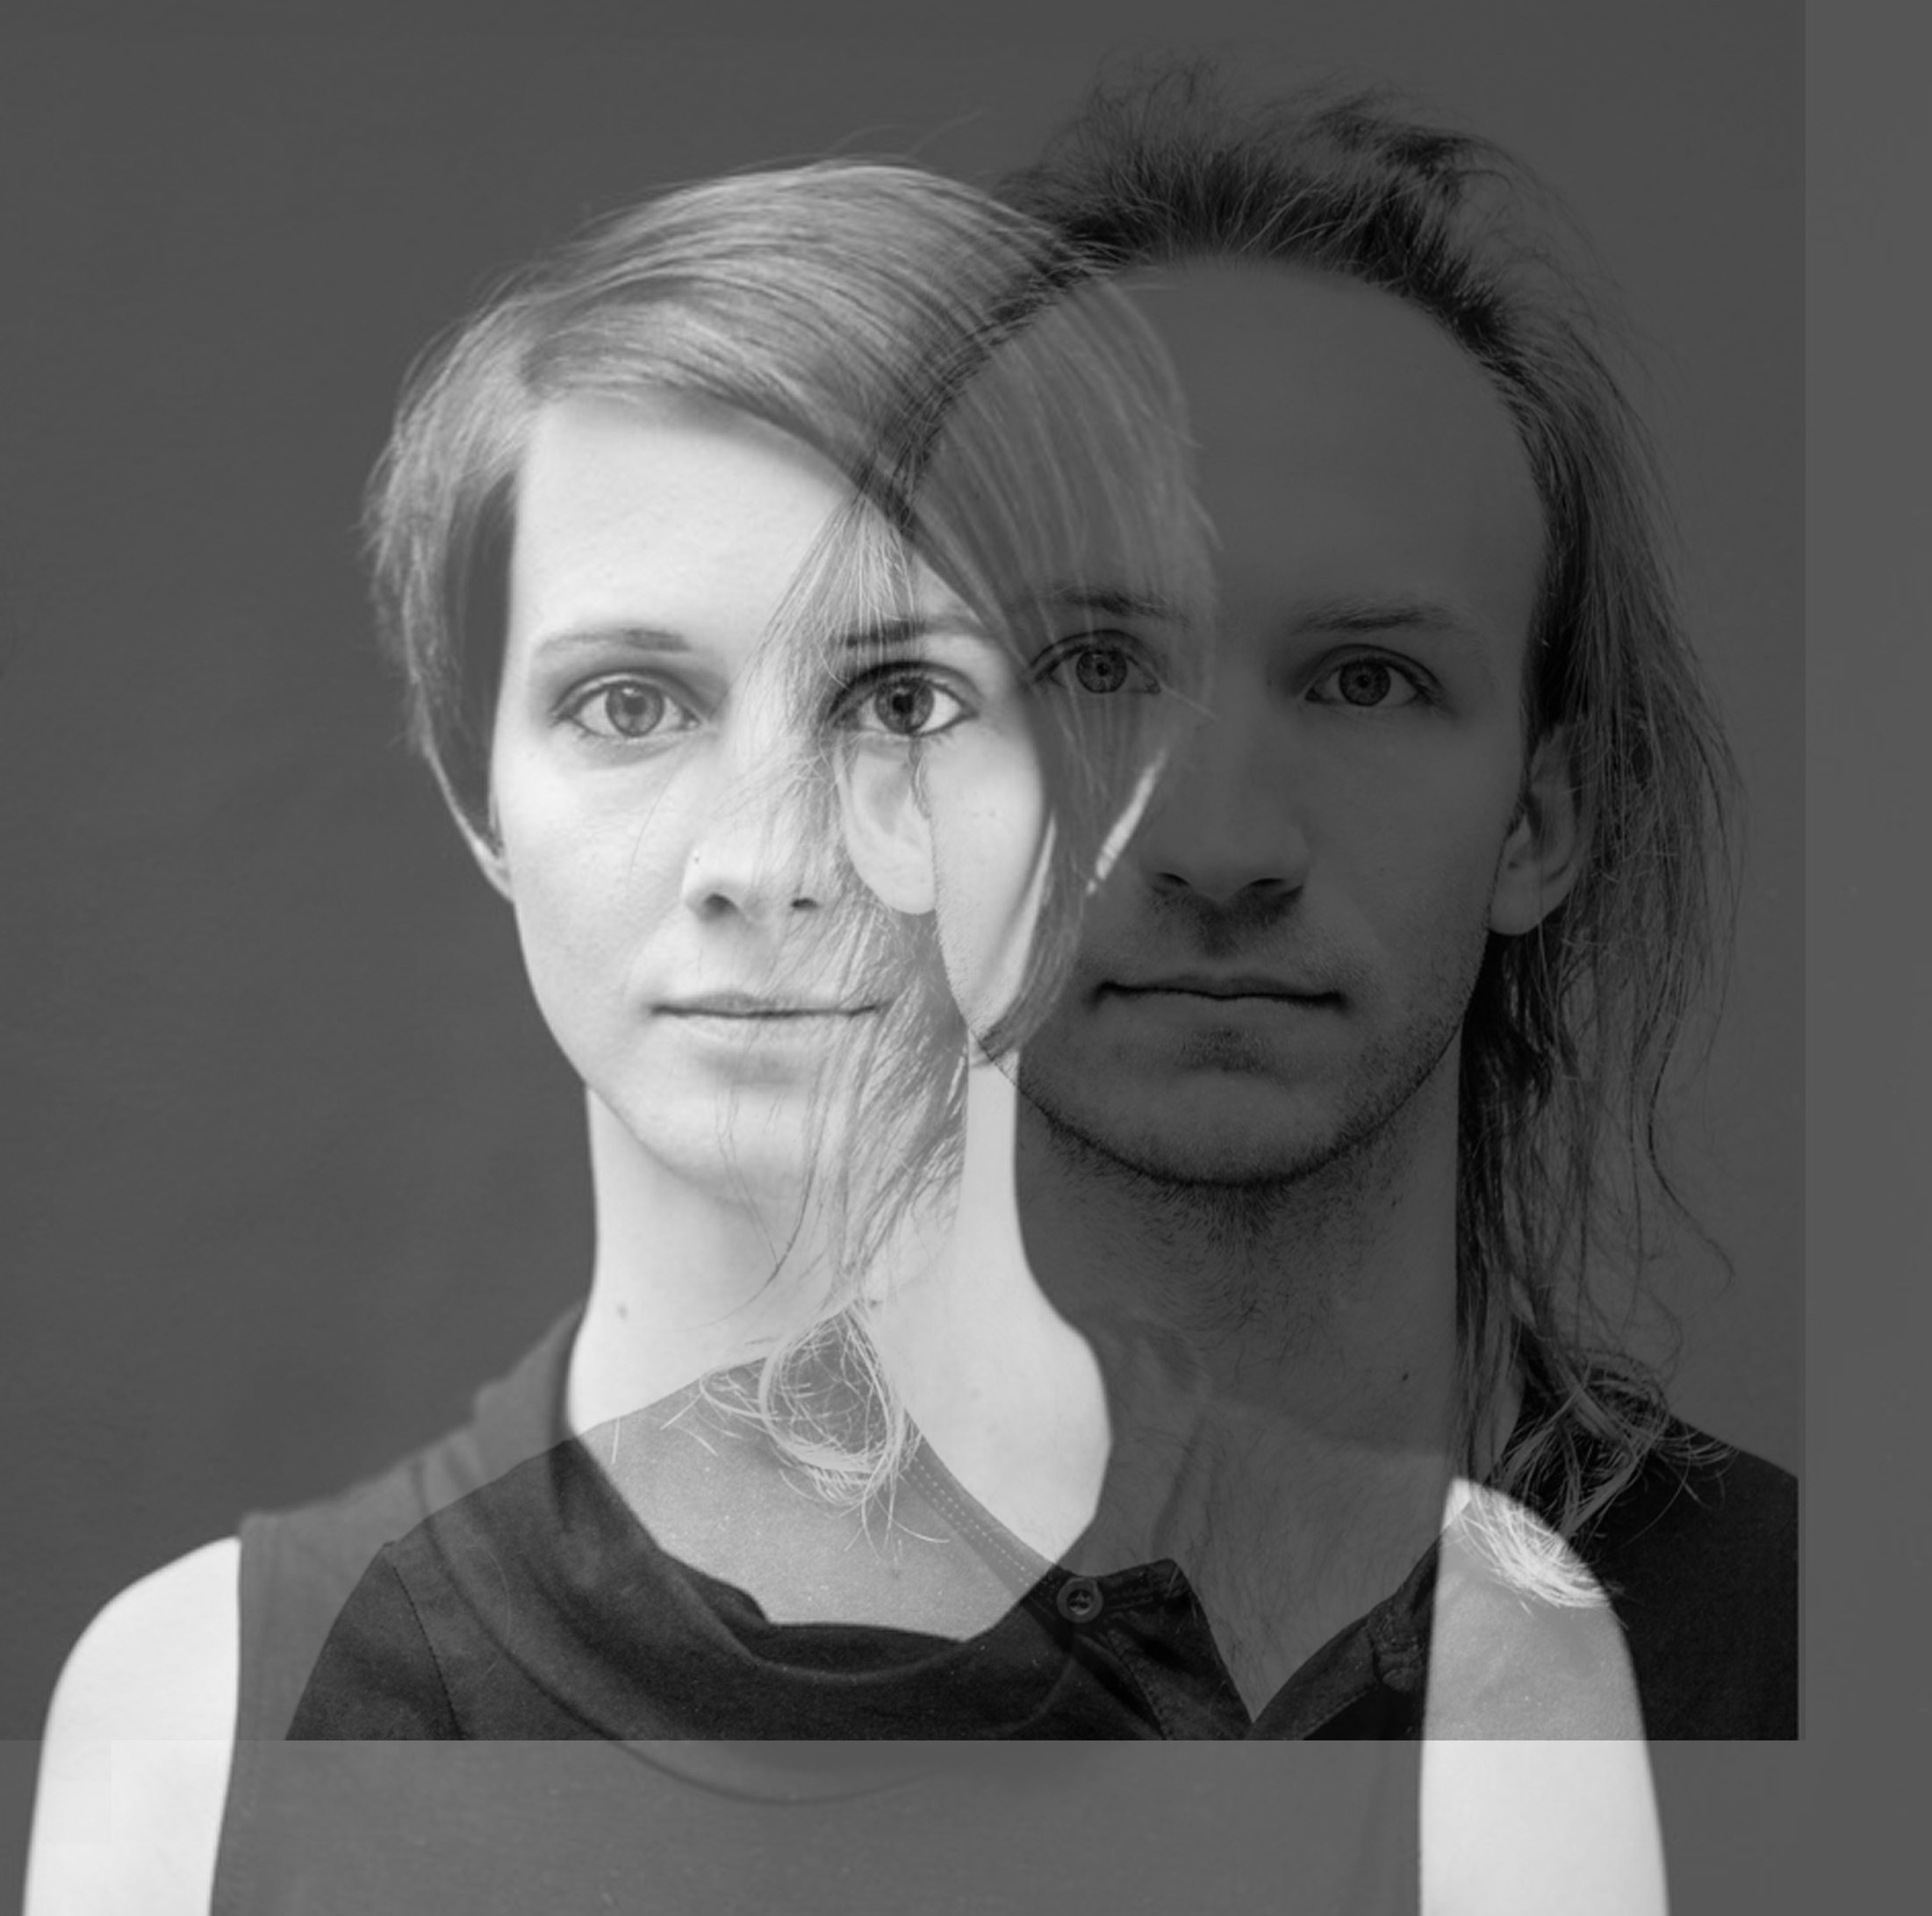 Ángela Tröndle & Pippo Corvino